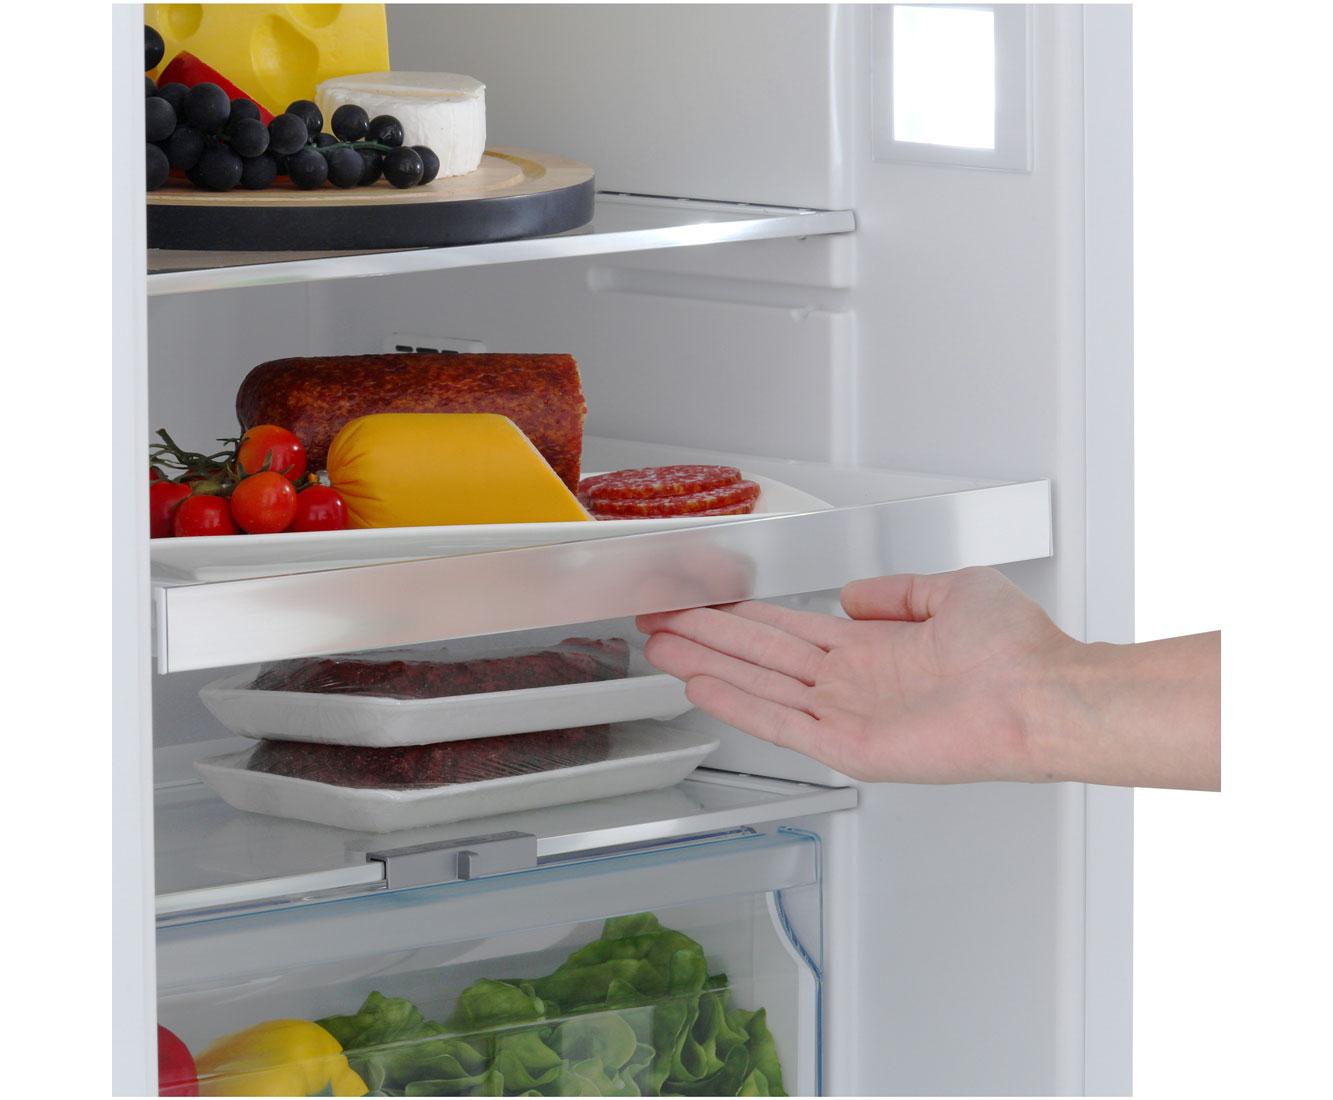 Bosch Kühlschrank Serie 6 : Bosch serie kir ad einbau kühlschrank er nische festtür